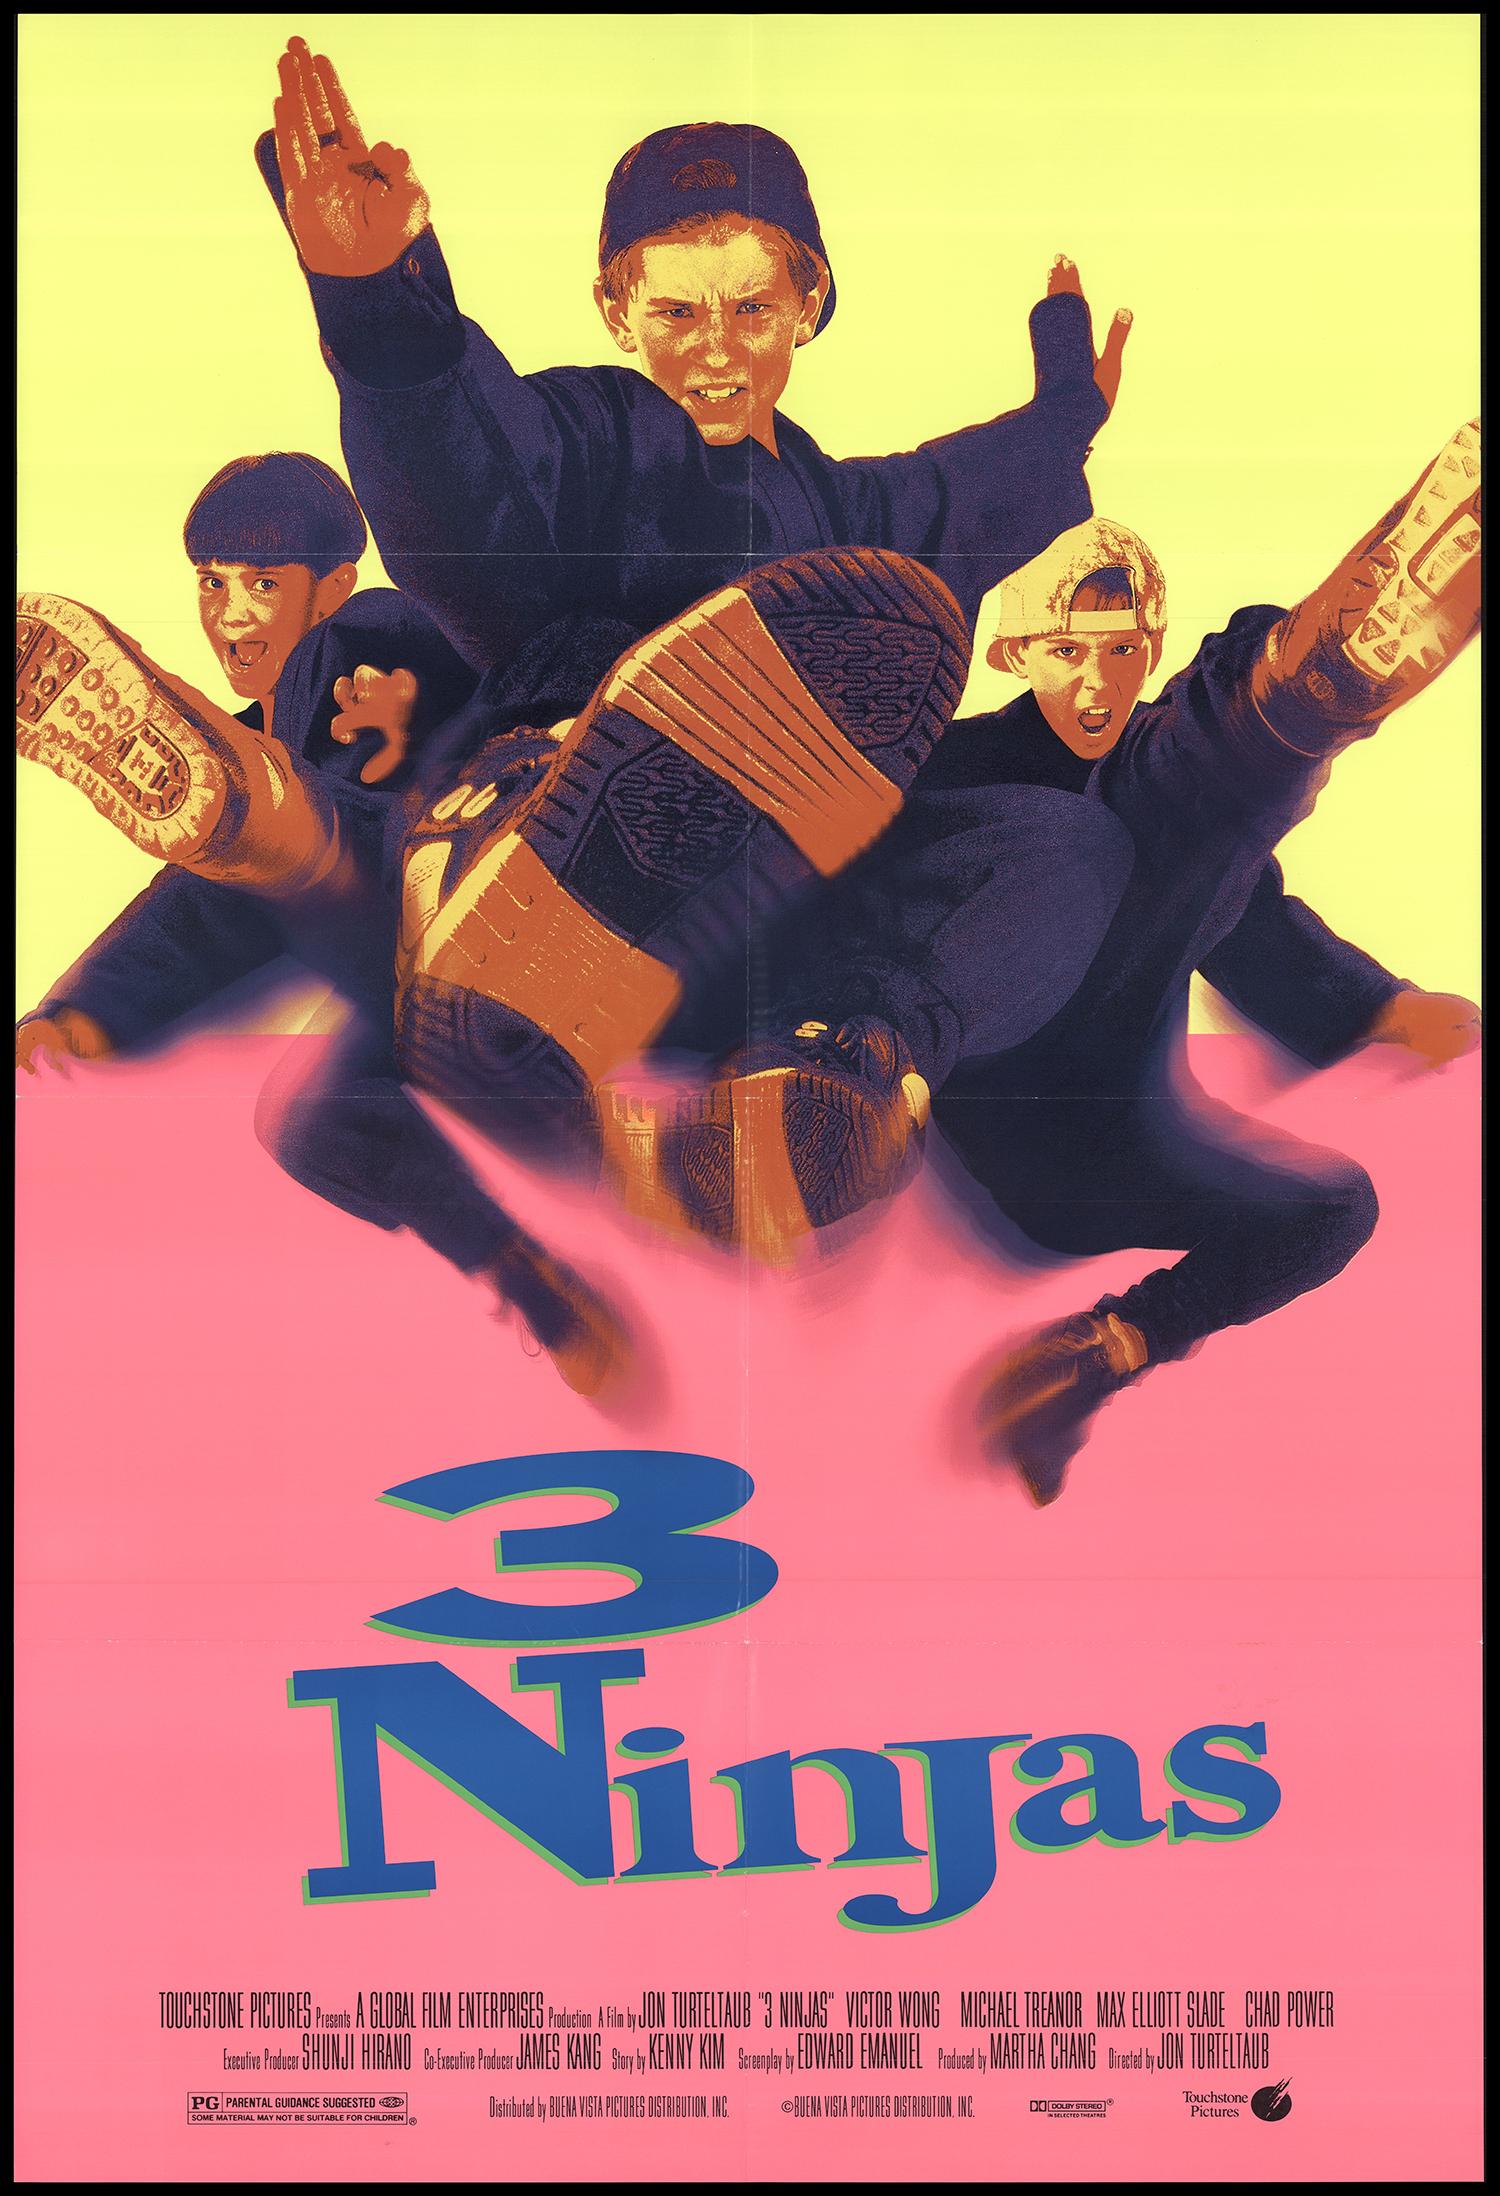 File:3 Ninjas.jpg